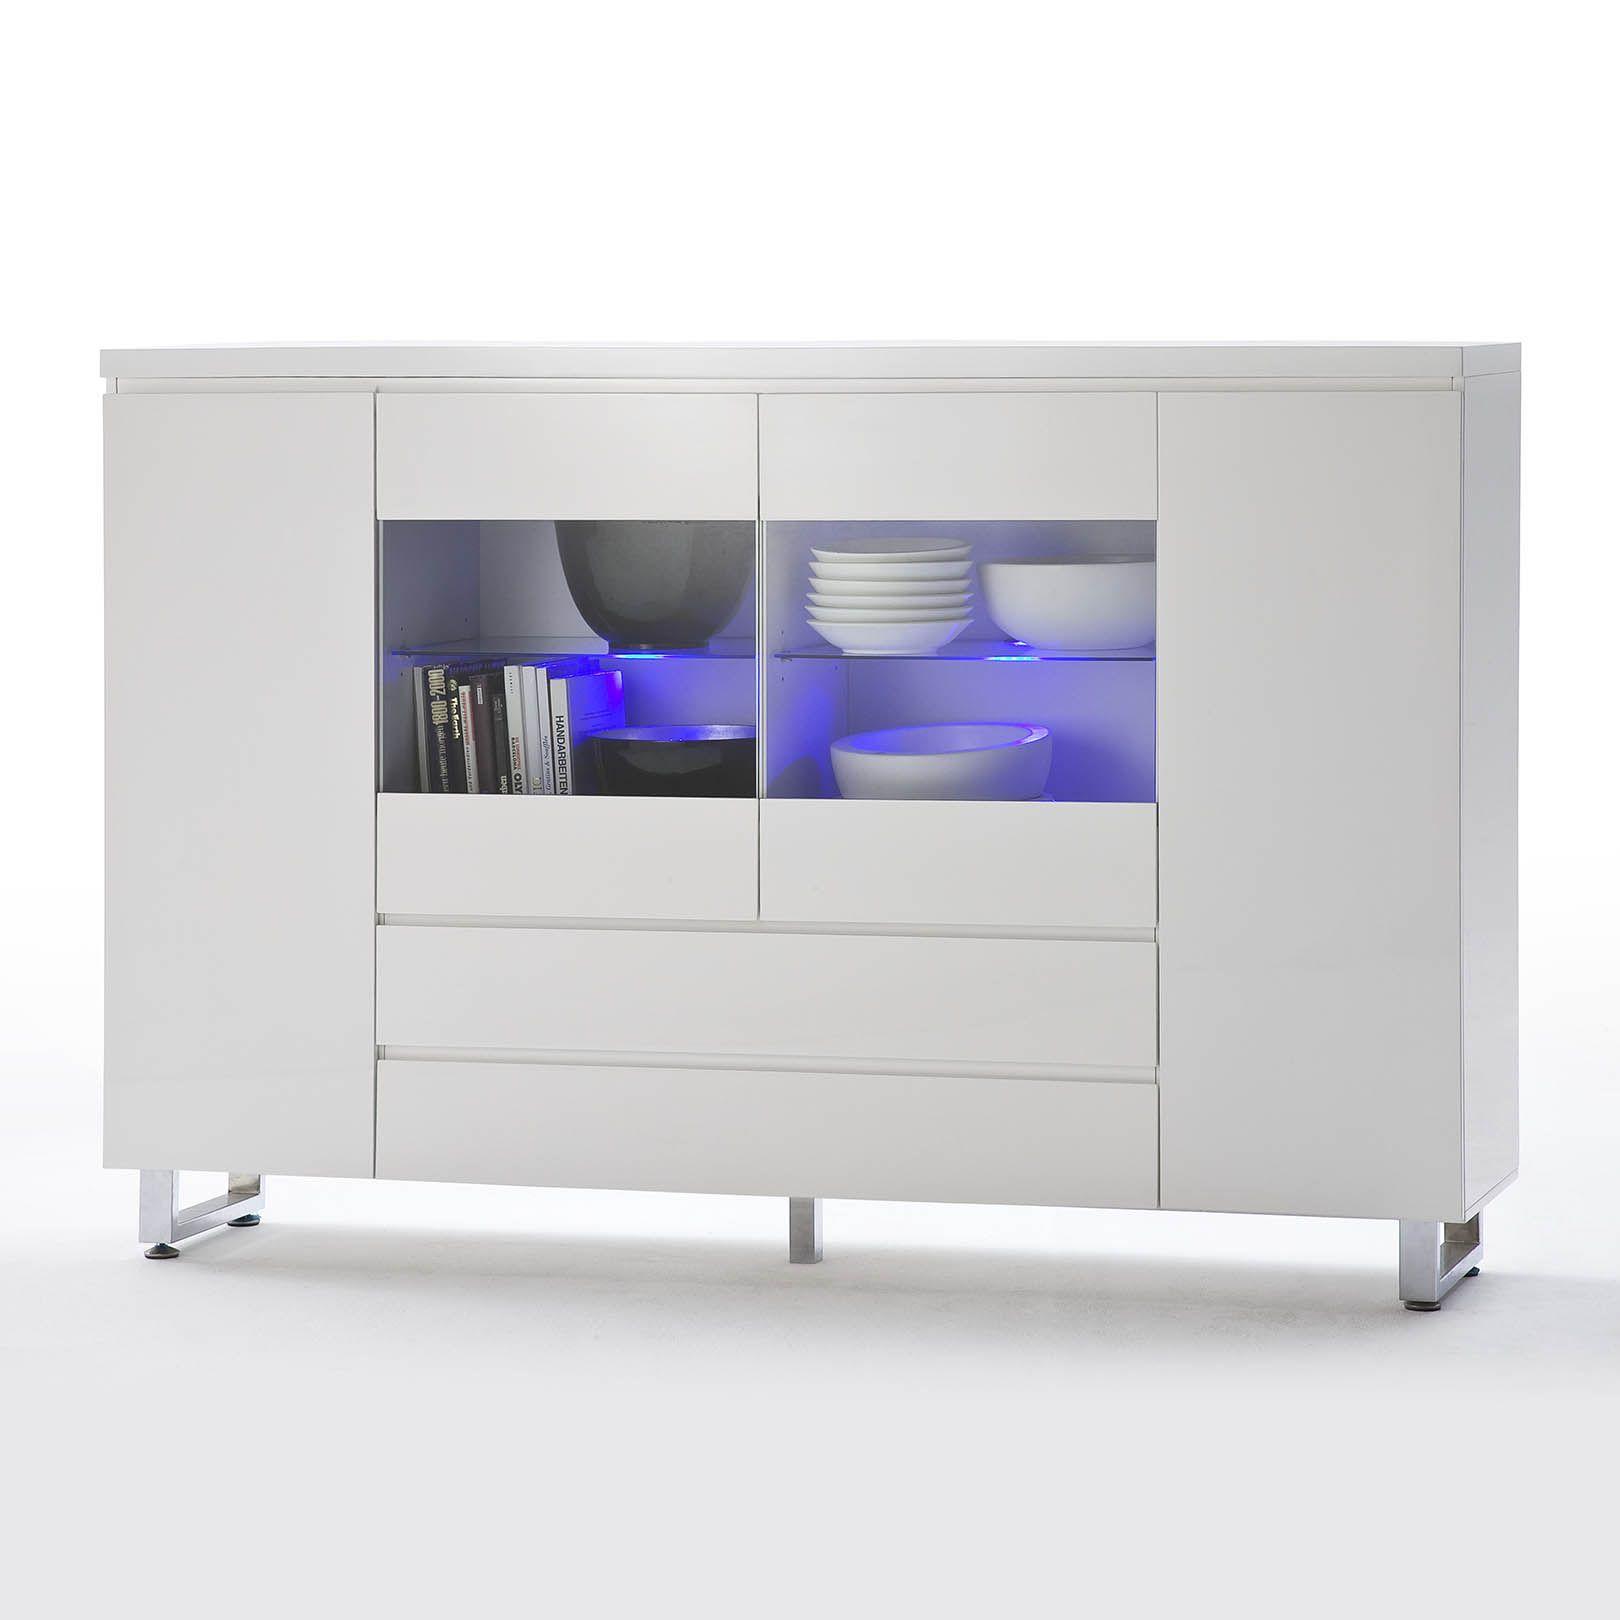 die besten 25 highboard wei hochglanz ideen auf pinterest tv highboard kommode hochglanz. Black Bedroom Furniture Sets. Home Design Ideas